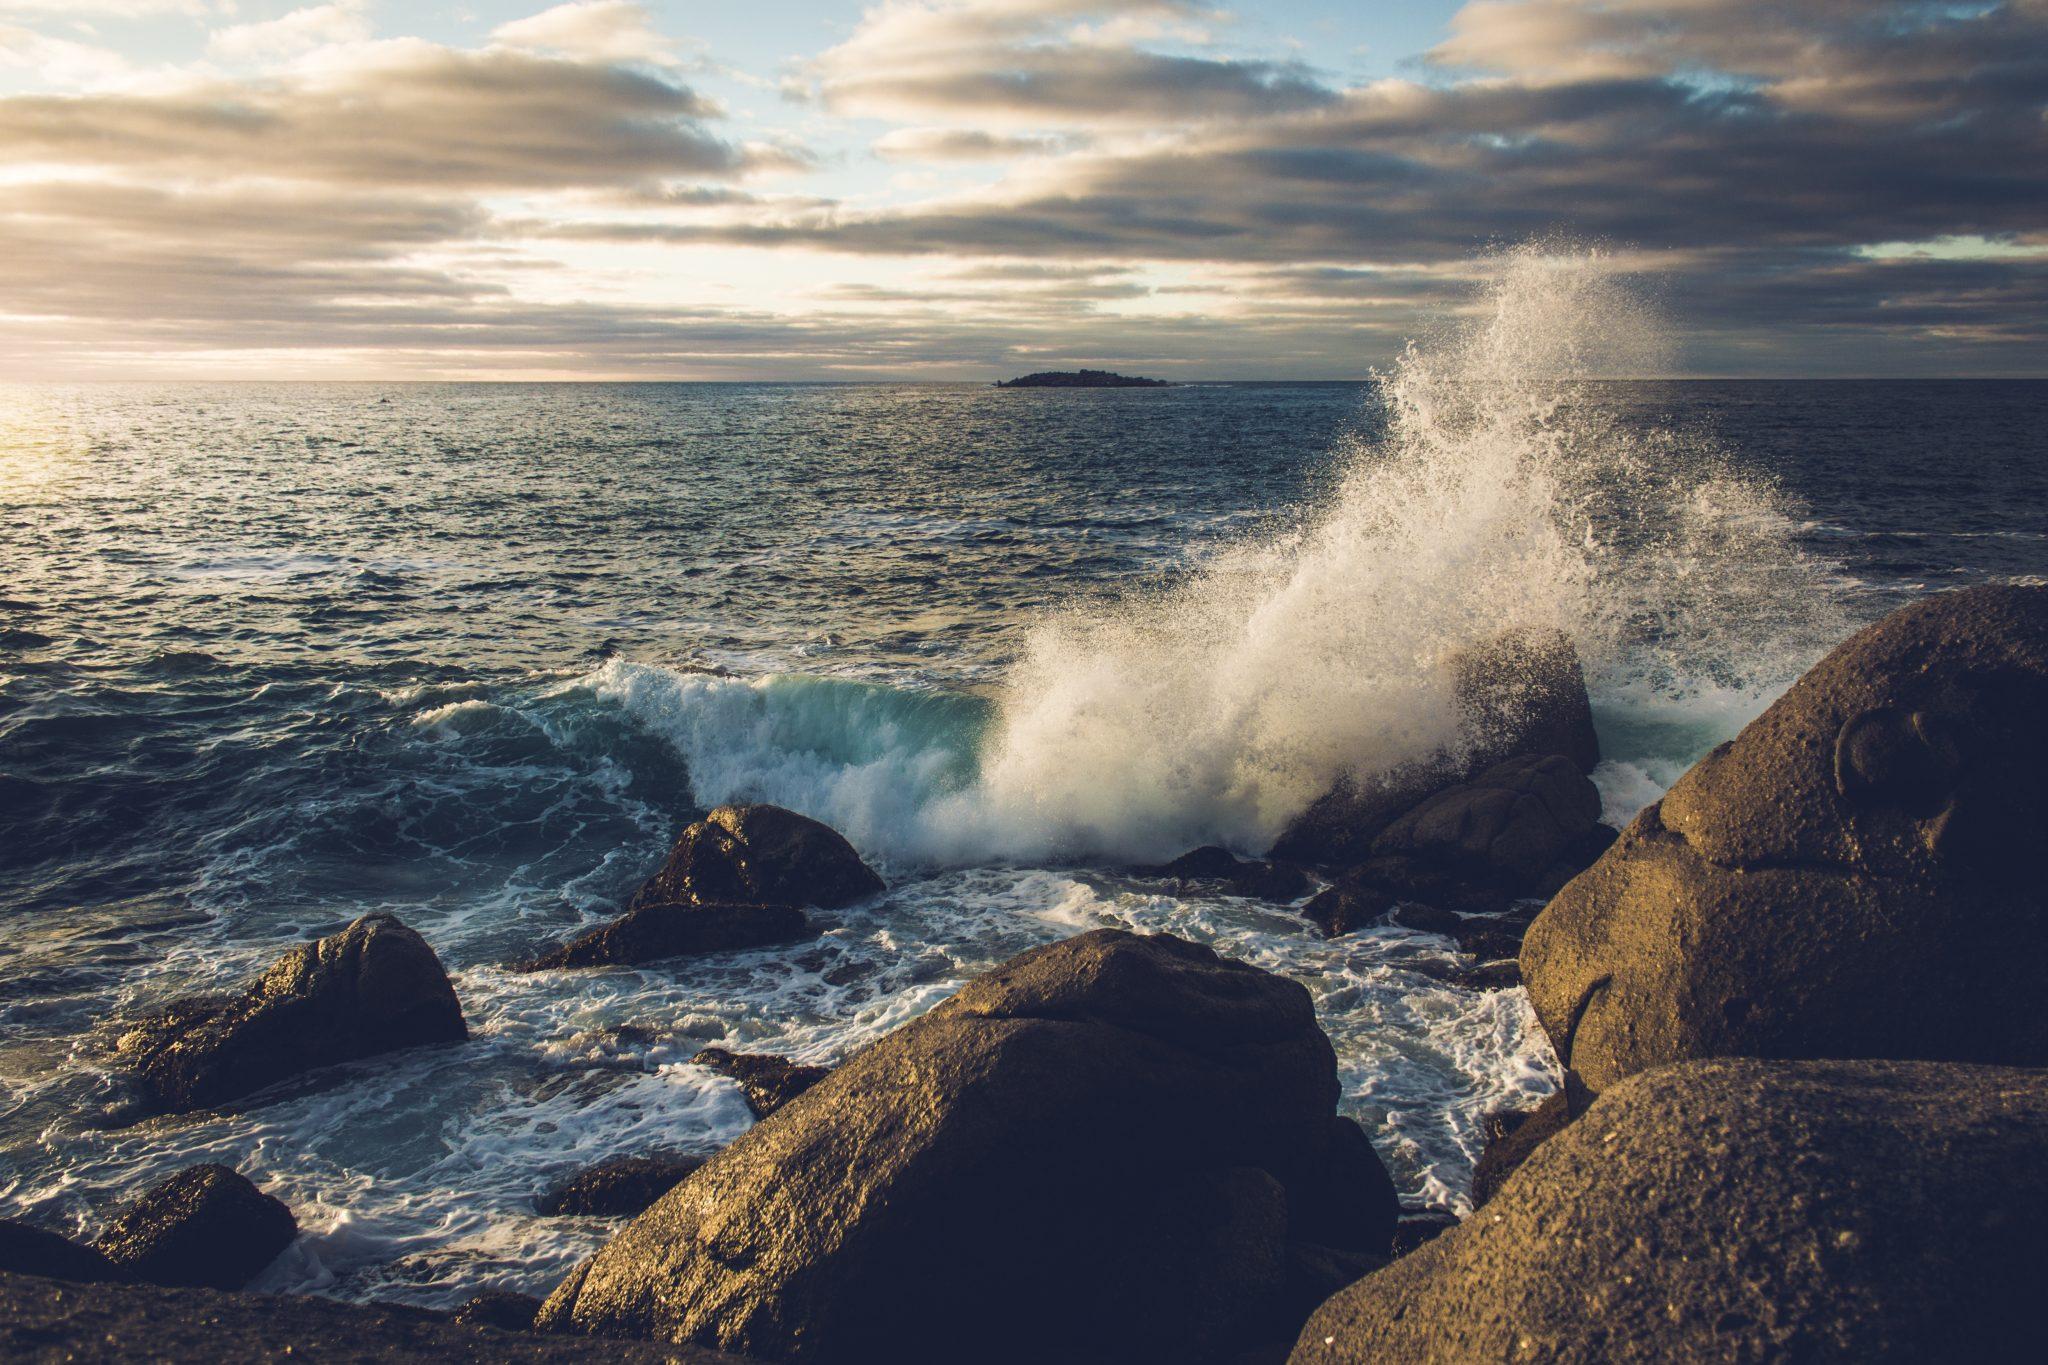 surf rocky shore